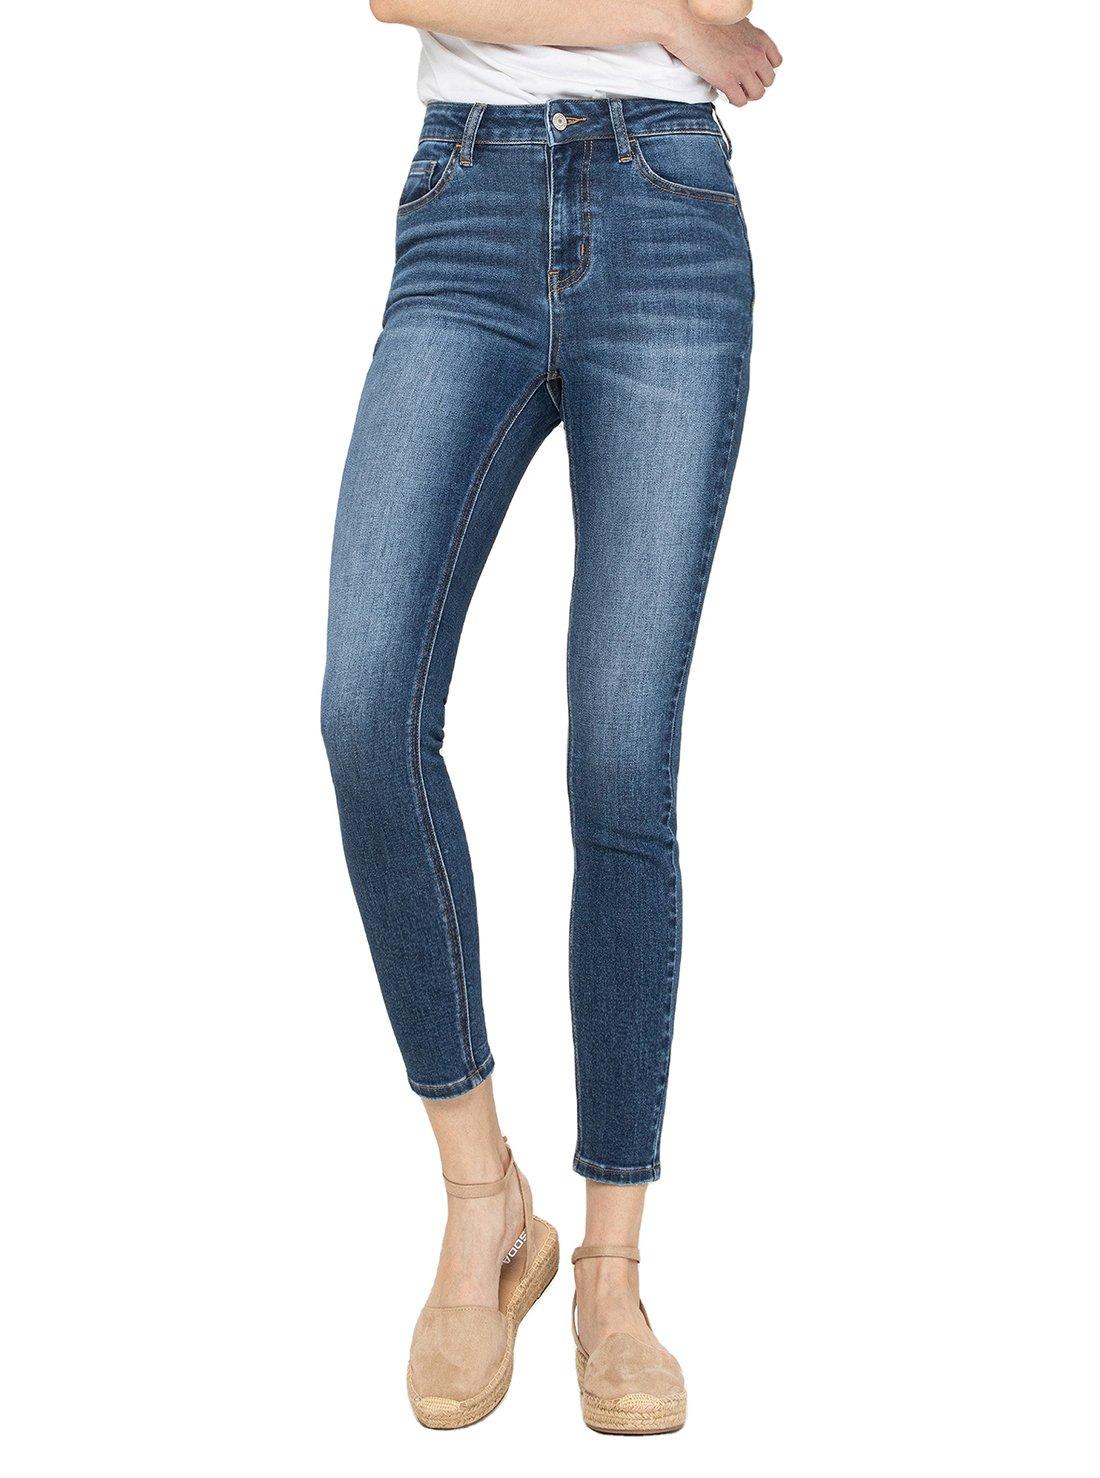 Low Waist Ladies Jeans